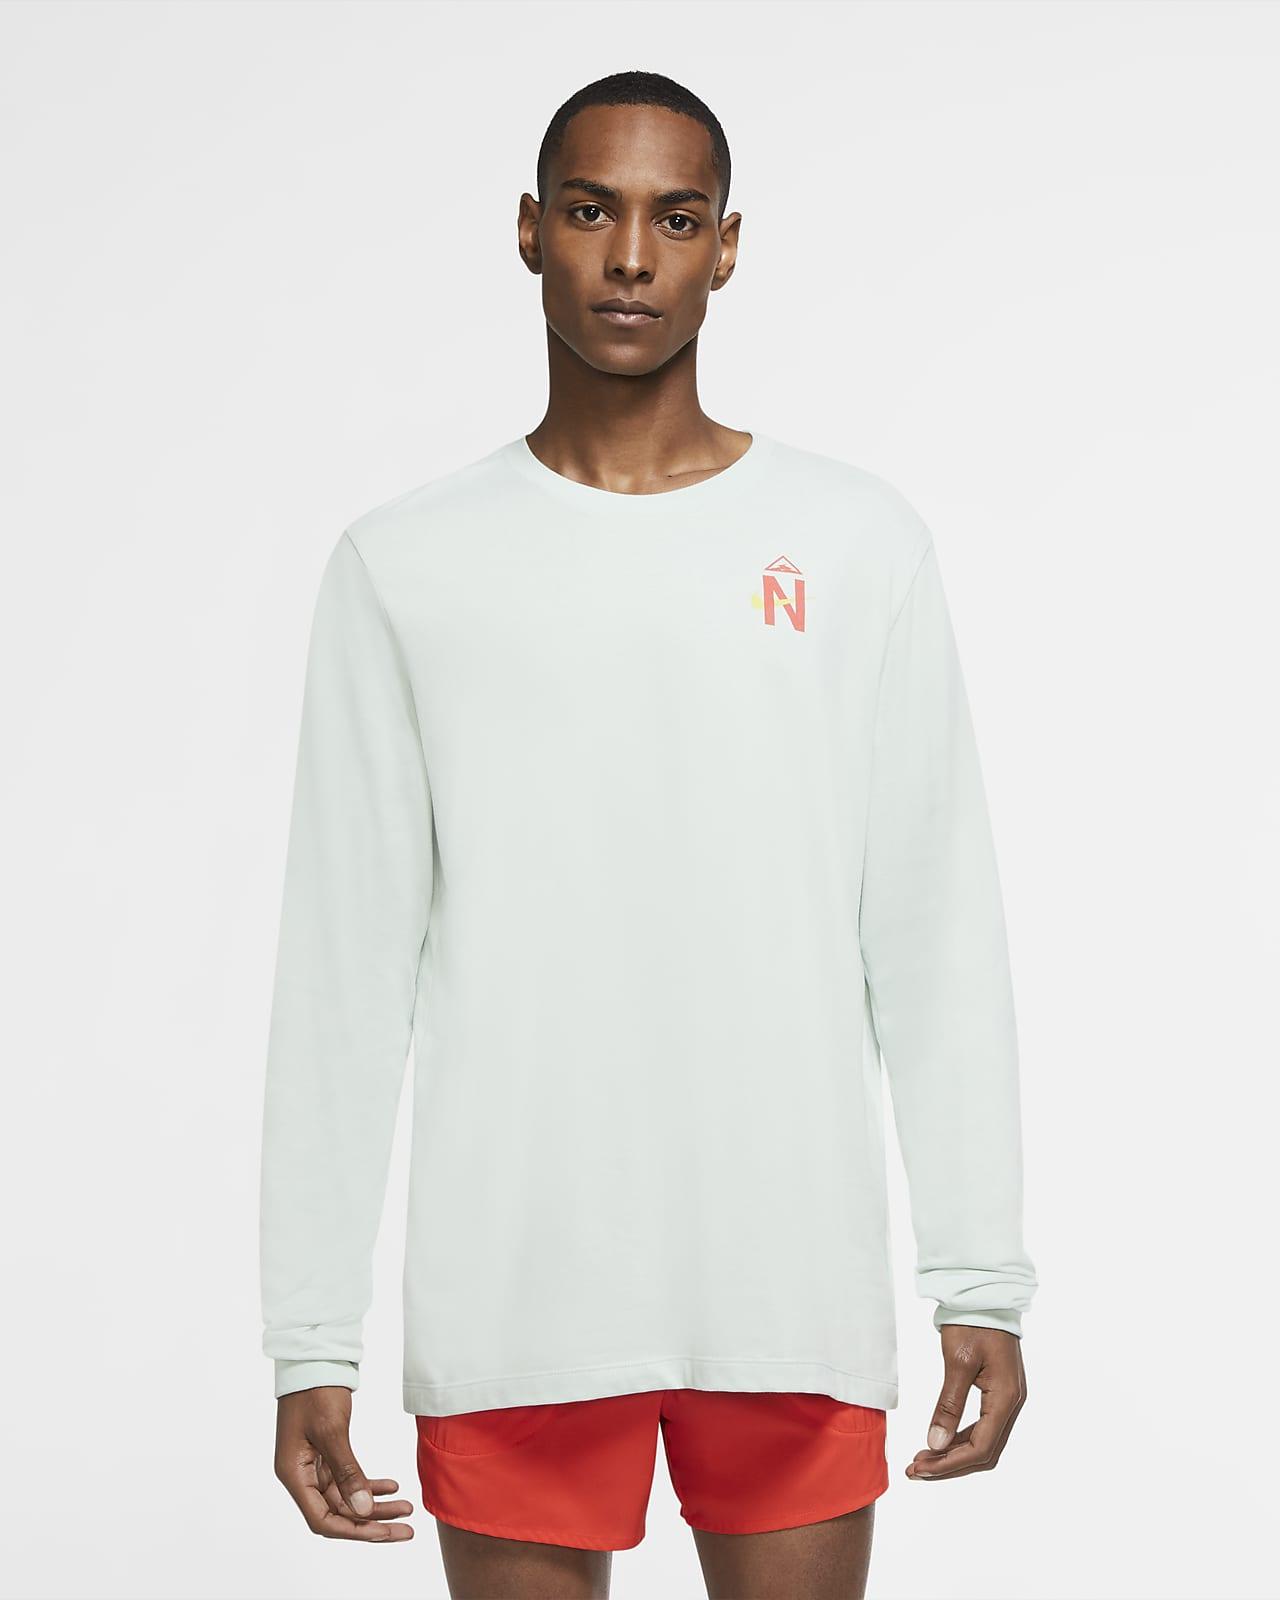 Мужская футболка для трейлраннинга с длинным рукавом Nike Dri-FIT Trail